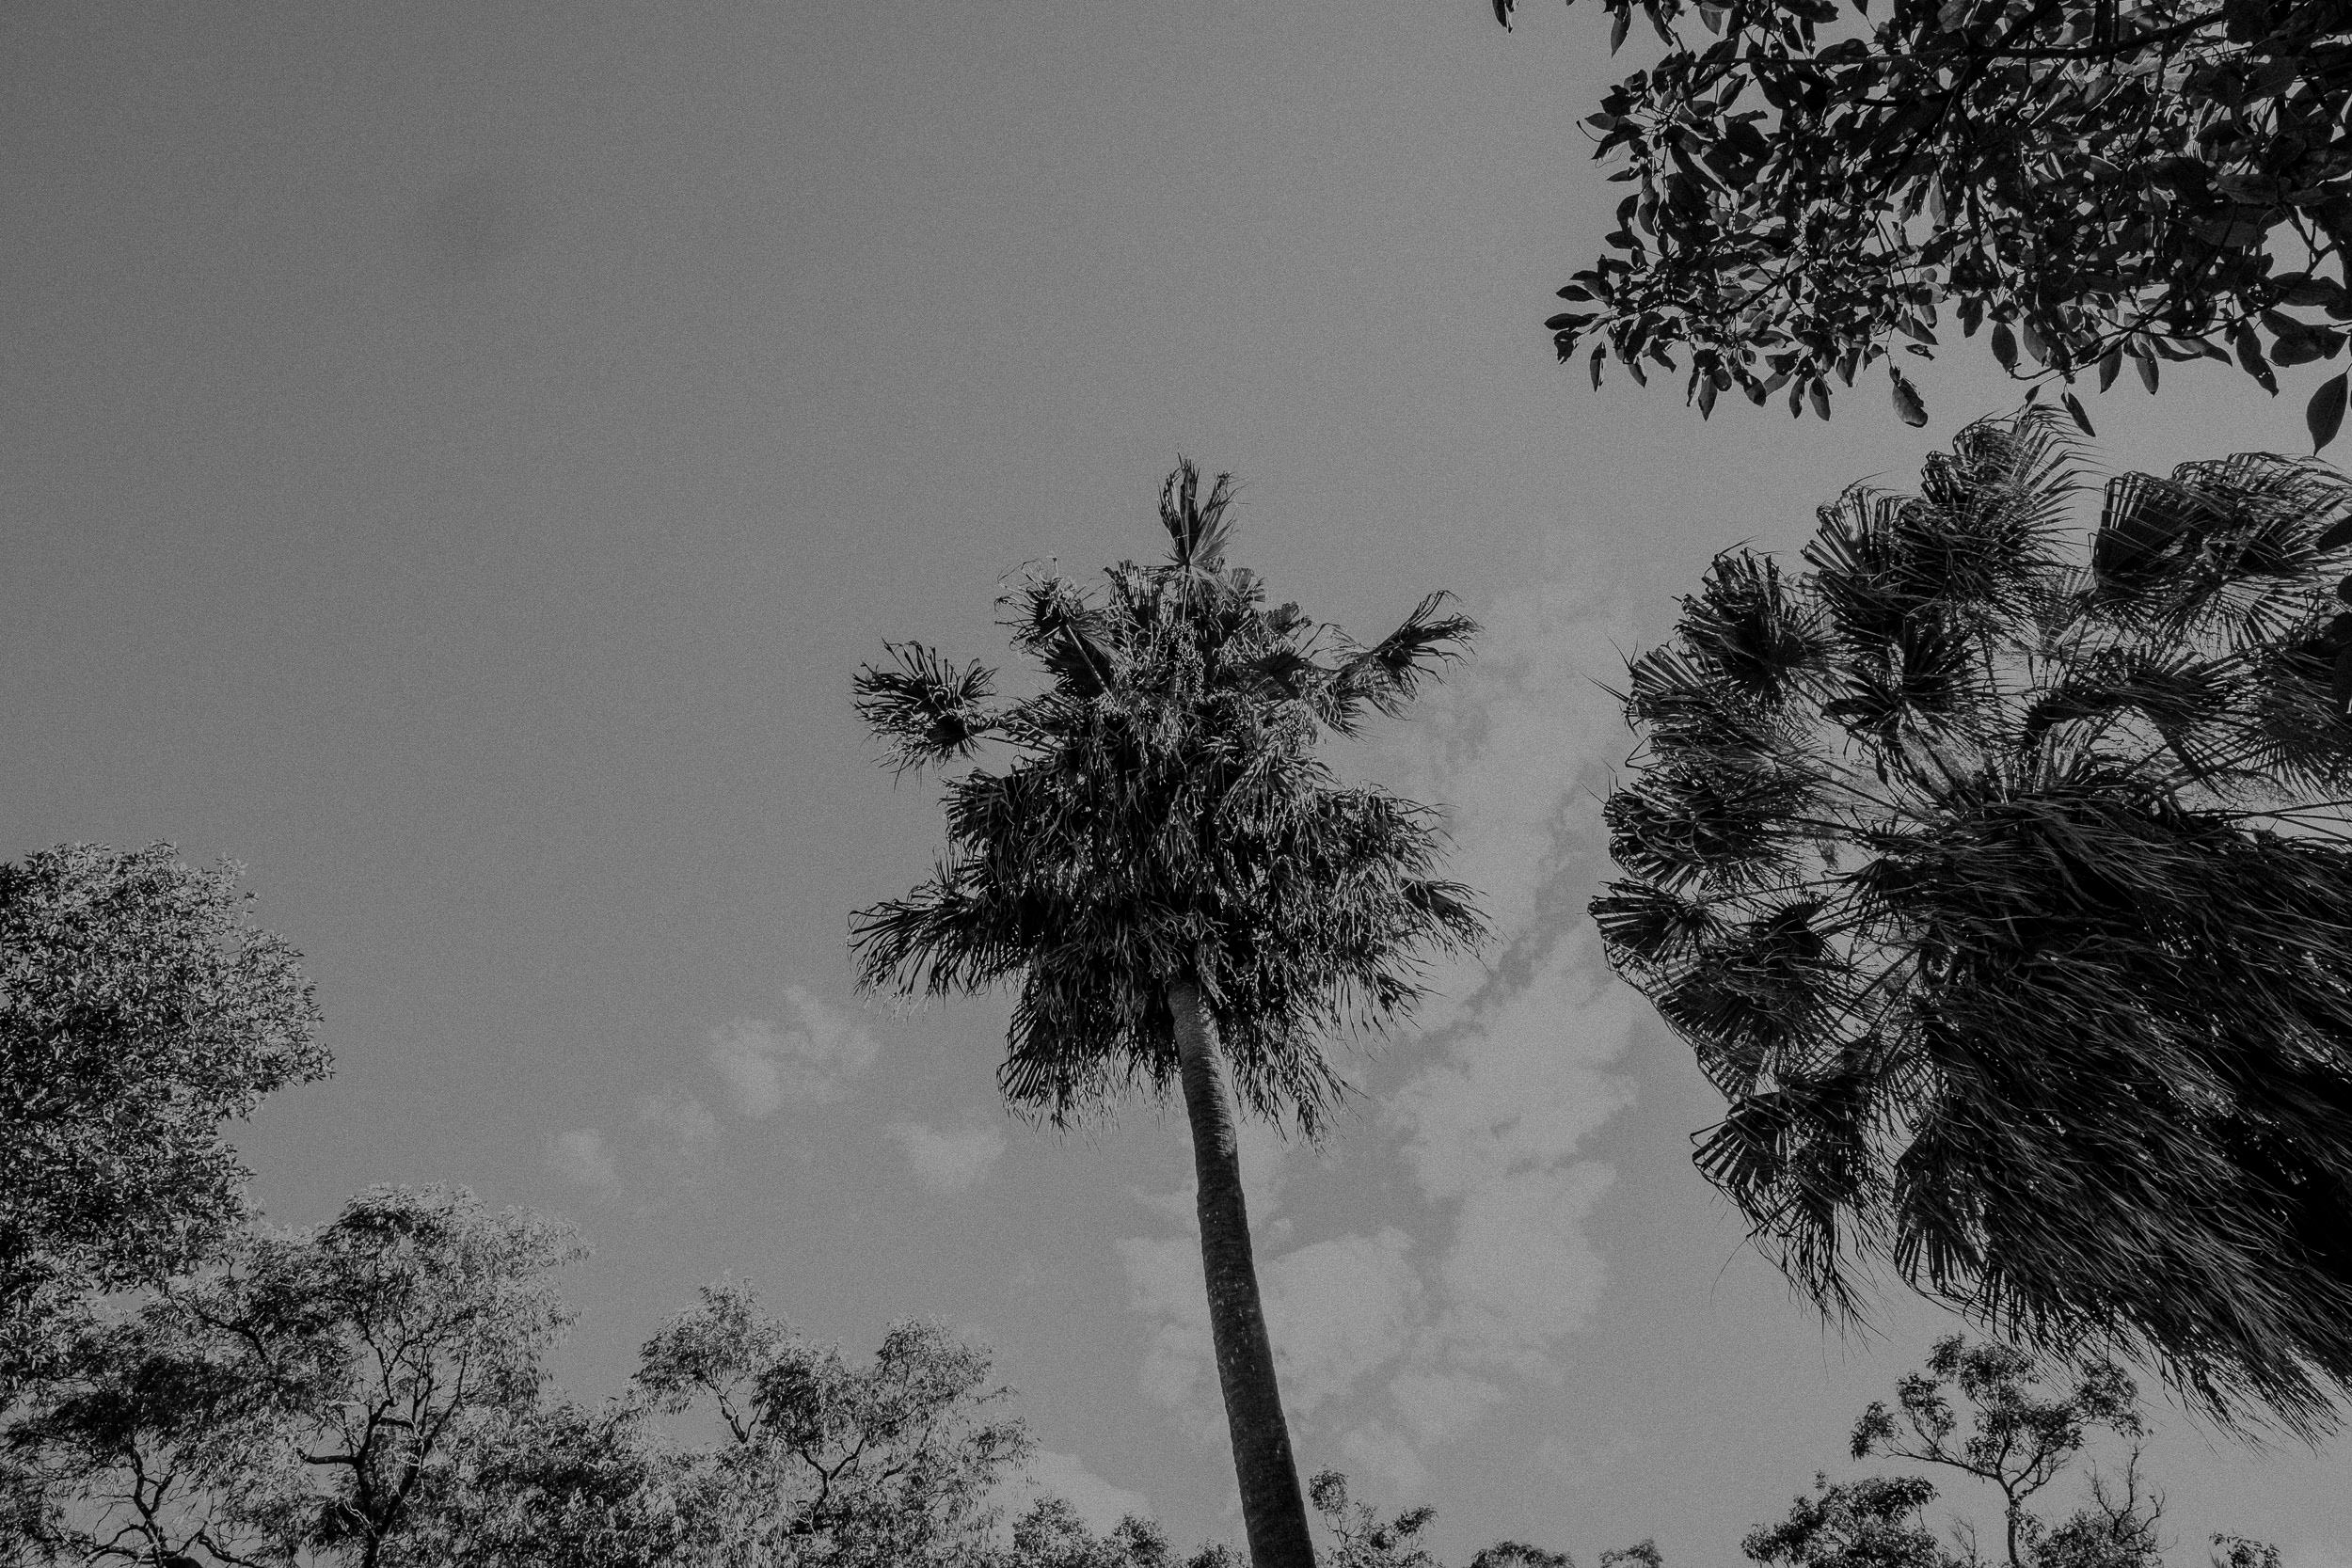 S&A Elopement - Kings & Thieves - Shred 'Til Dead - Central Coast Beach Forest Wedding - 41.jpg